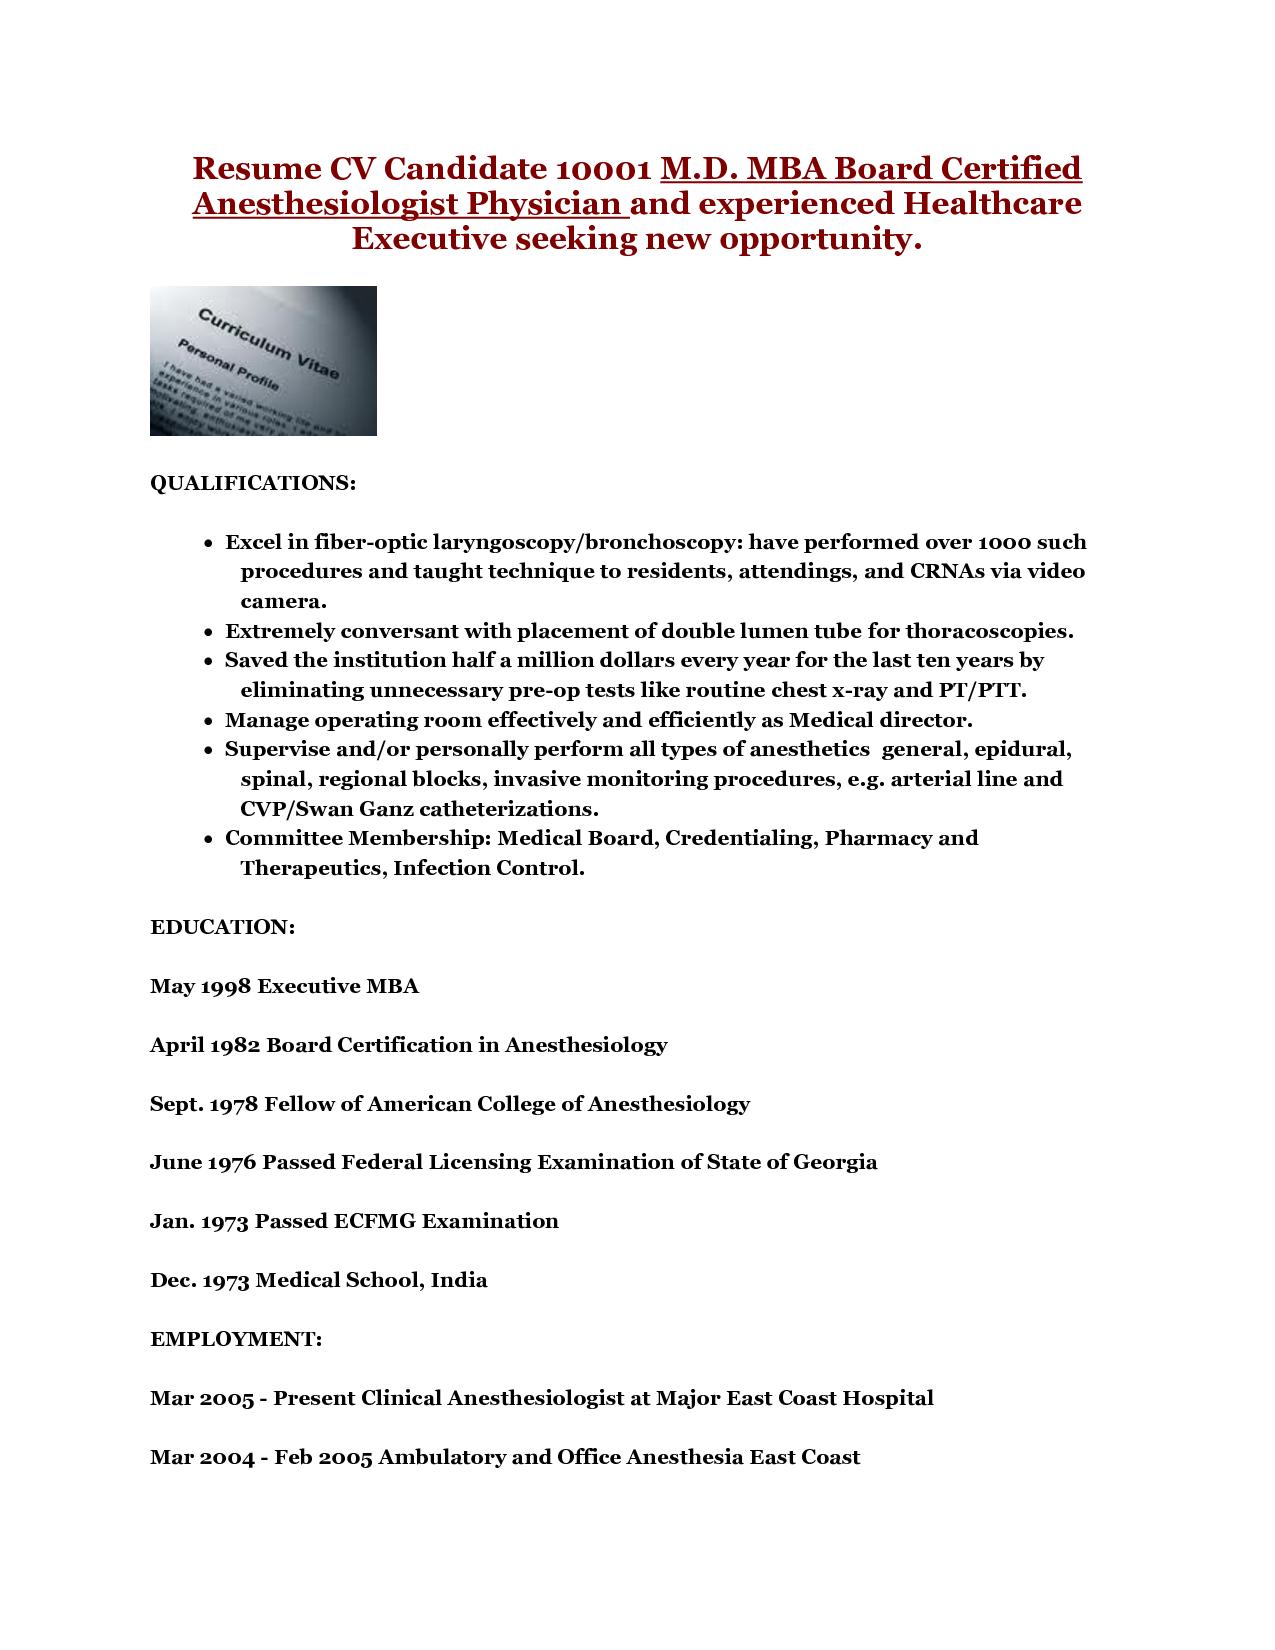 Mba Candidate Resume   Http://www.resumecareer.info/mba